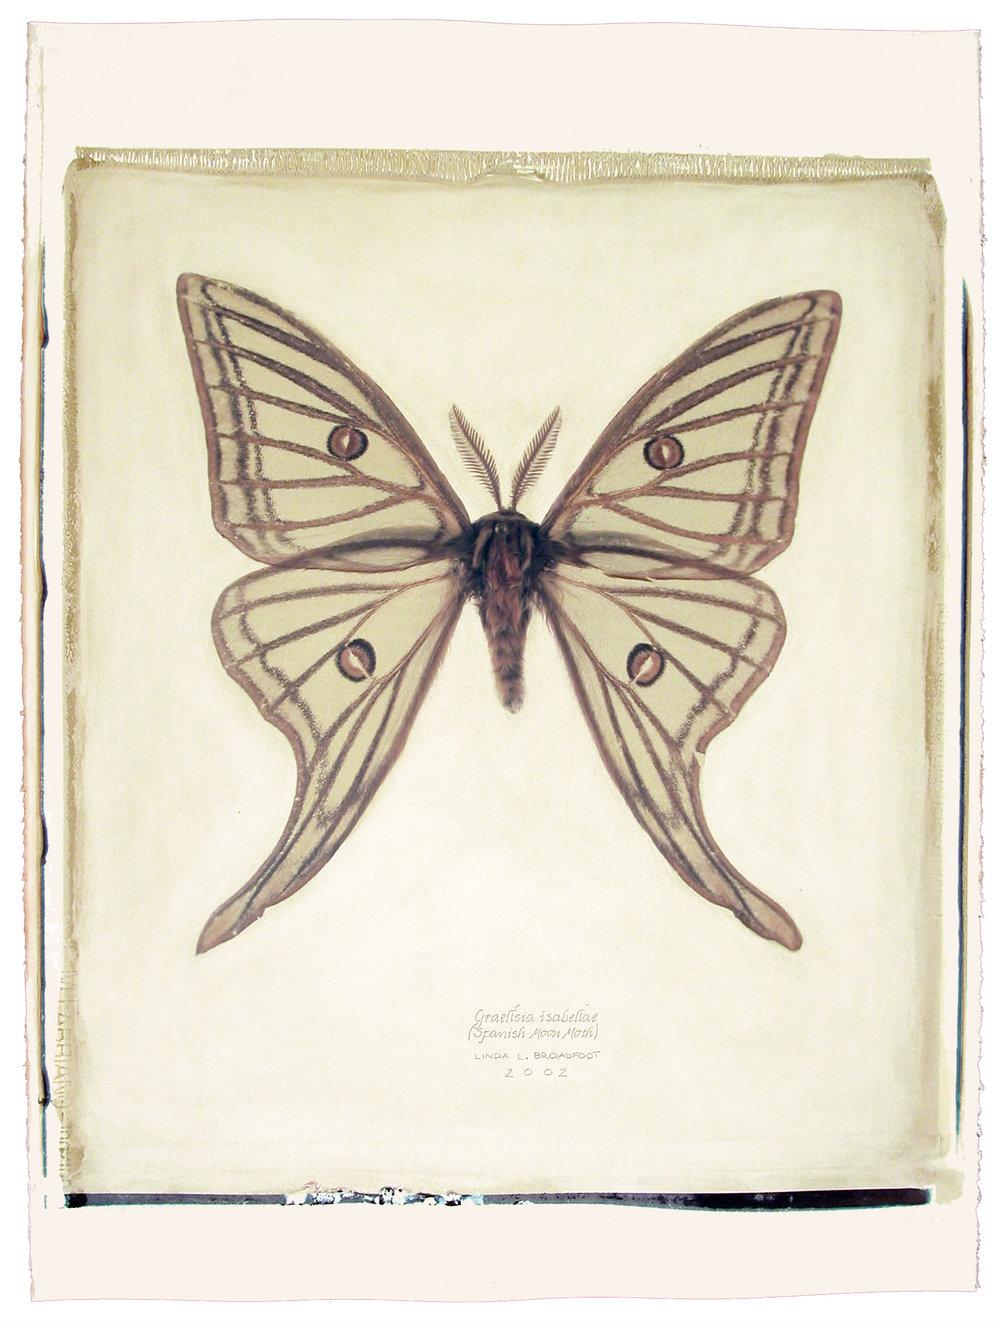 Graellsia isabellae  (Spanish Moon Moth), 2002